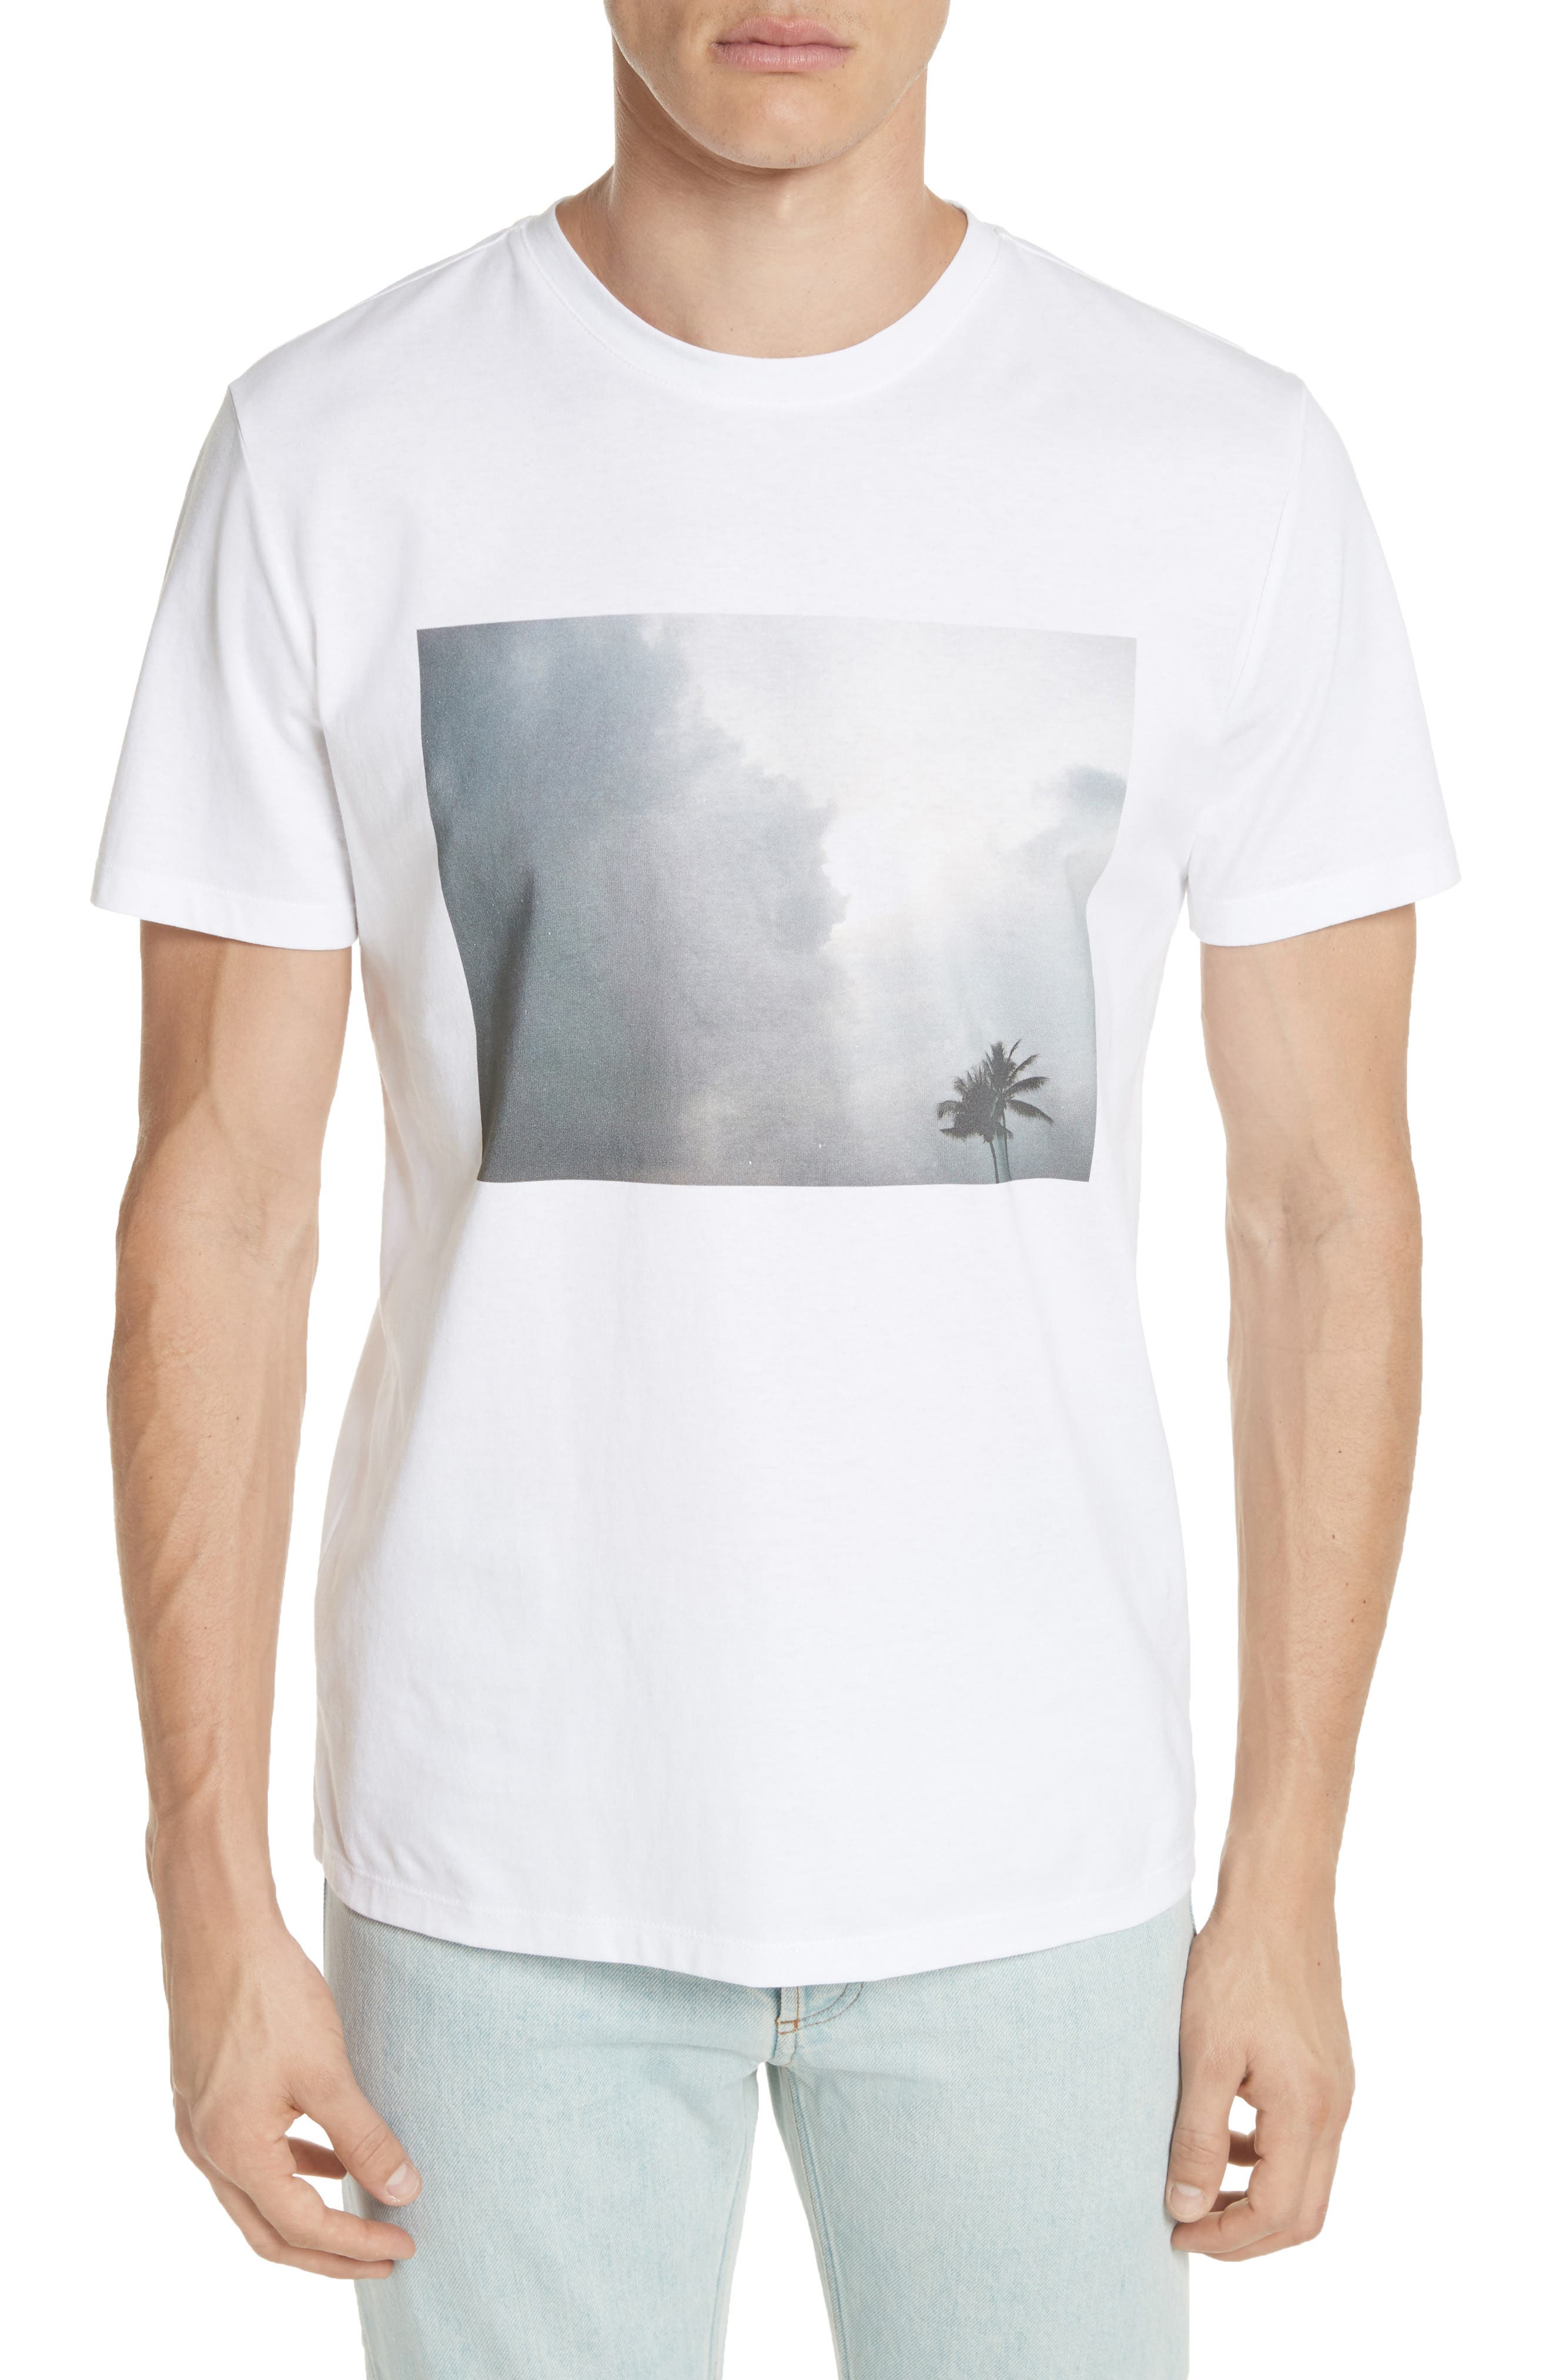 A.P.C. Tropicool Graphic T-Shirt